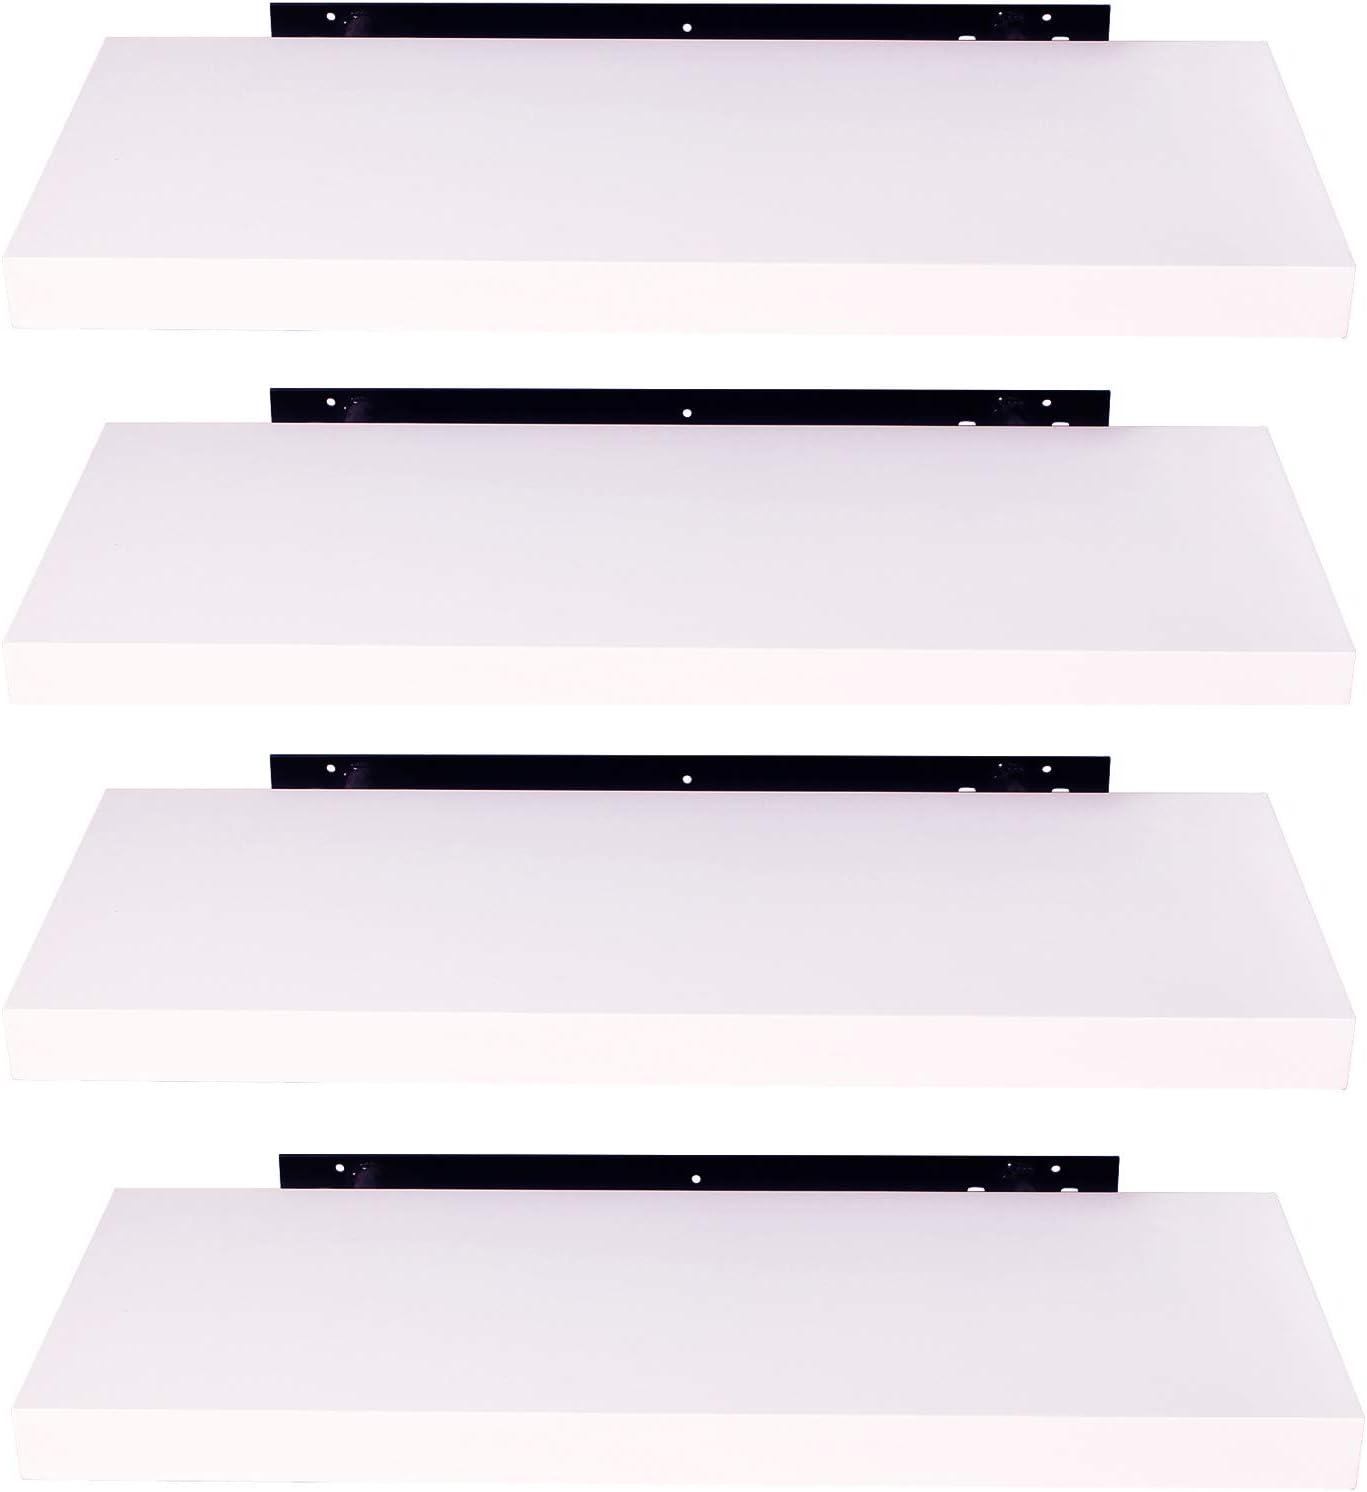 EUGAD Juego de 4 Estantería Pared Madera Blanco Estante Flotante para Colgar Libro CD en Cocina Salon Dormitorio 30cm 0086QJ